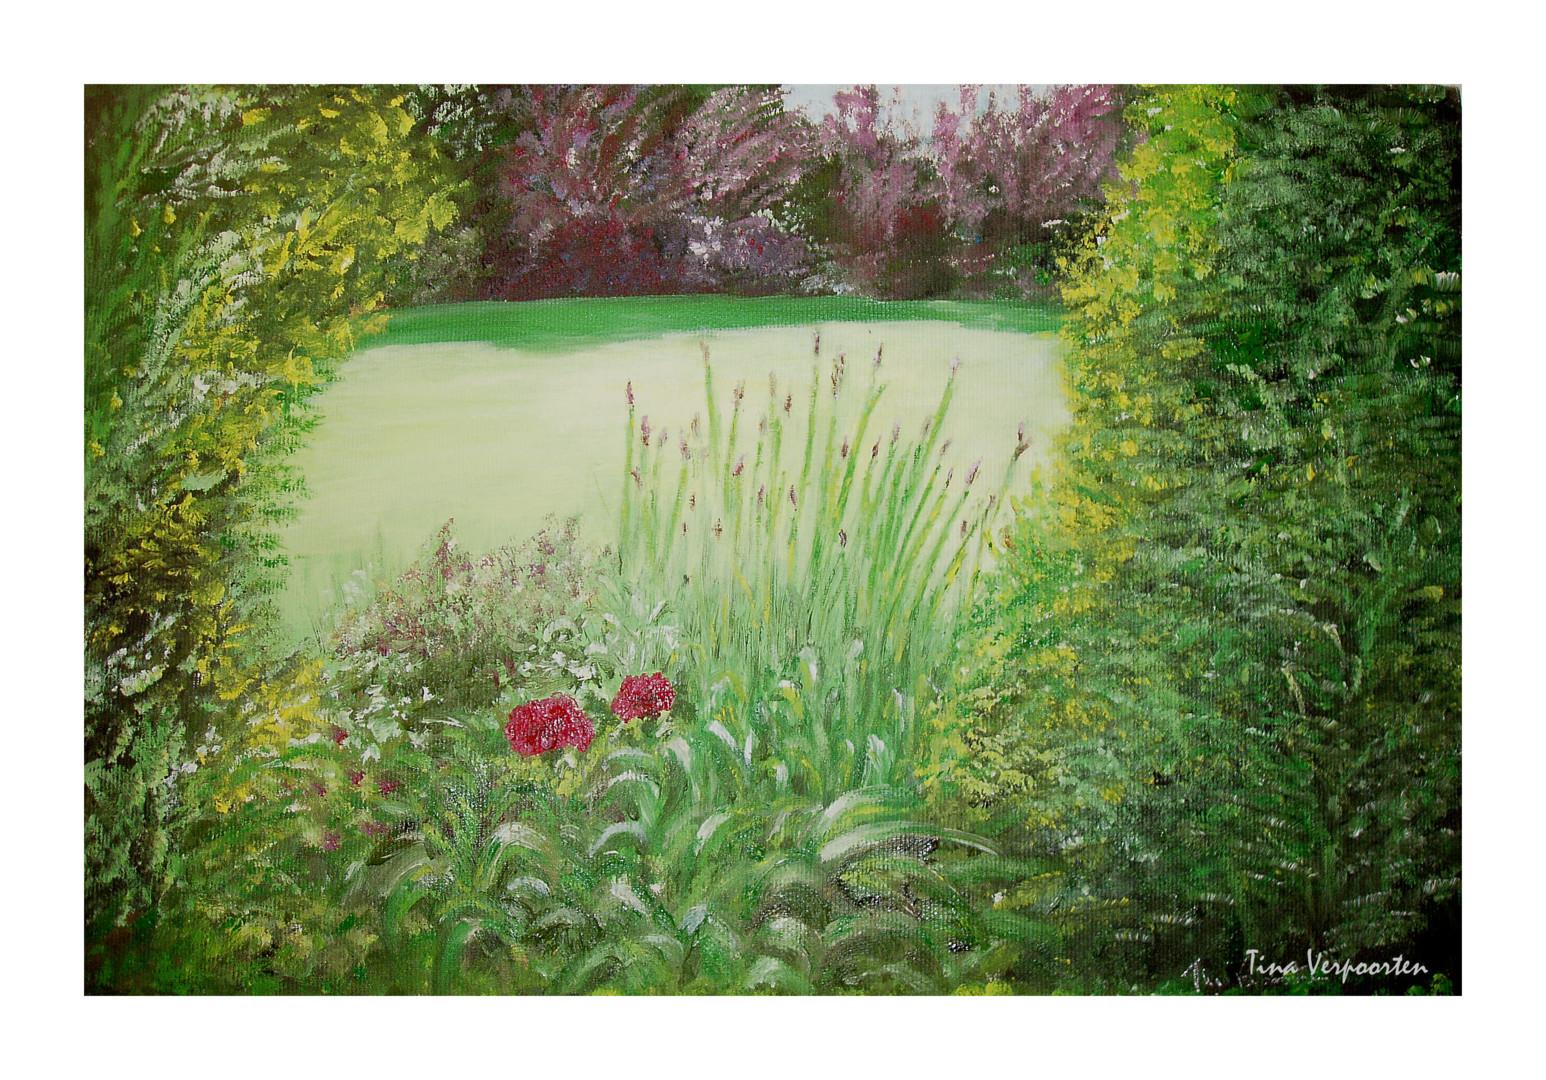 Tina Verpoorten - Un coin du jardin de Do.jpg